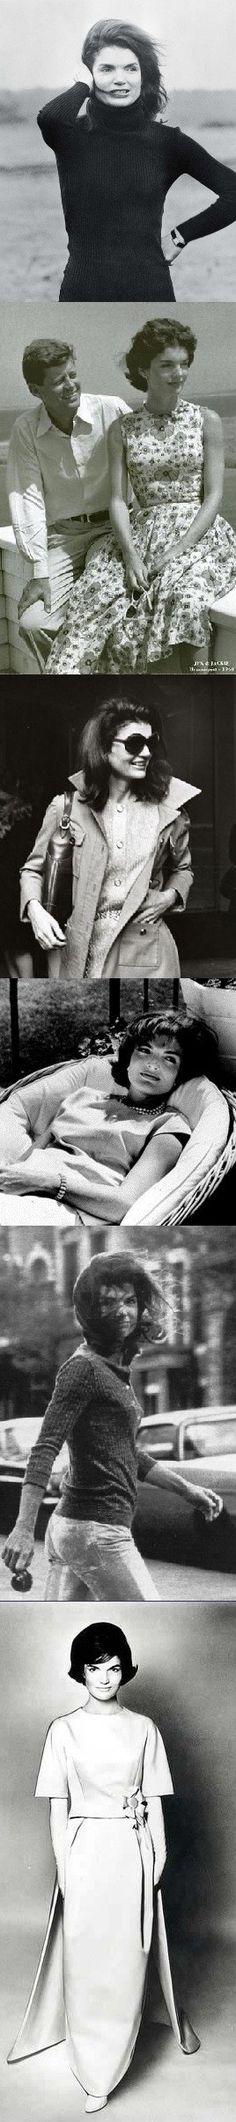 Jackie Kennedy Onassis, timeless fashion <3